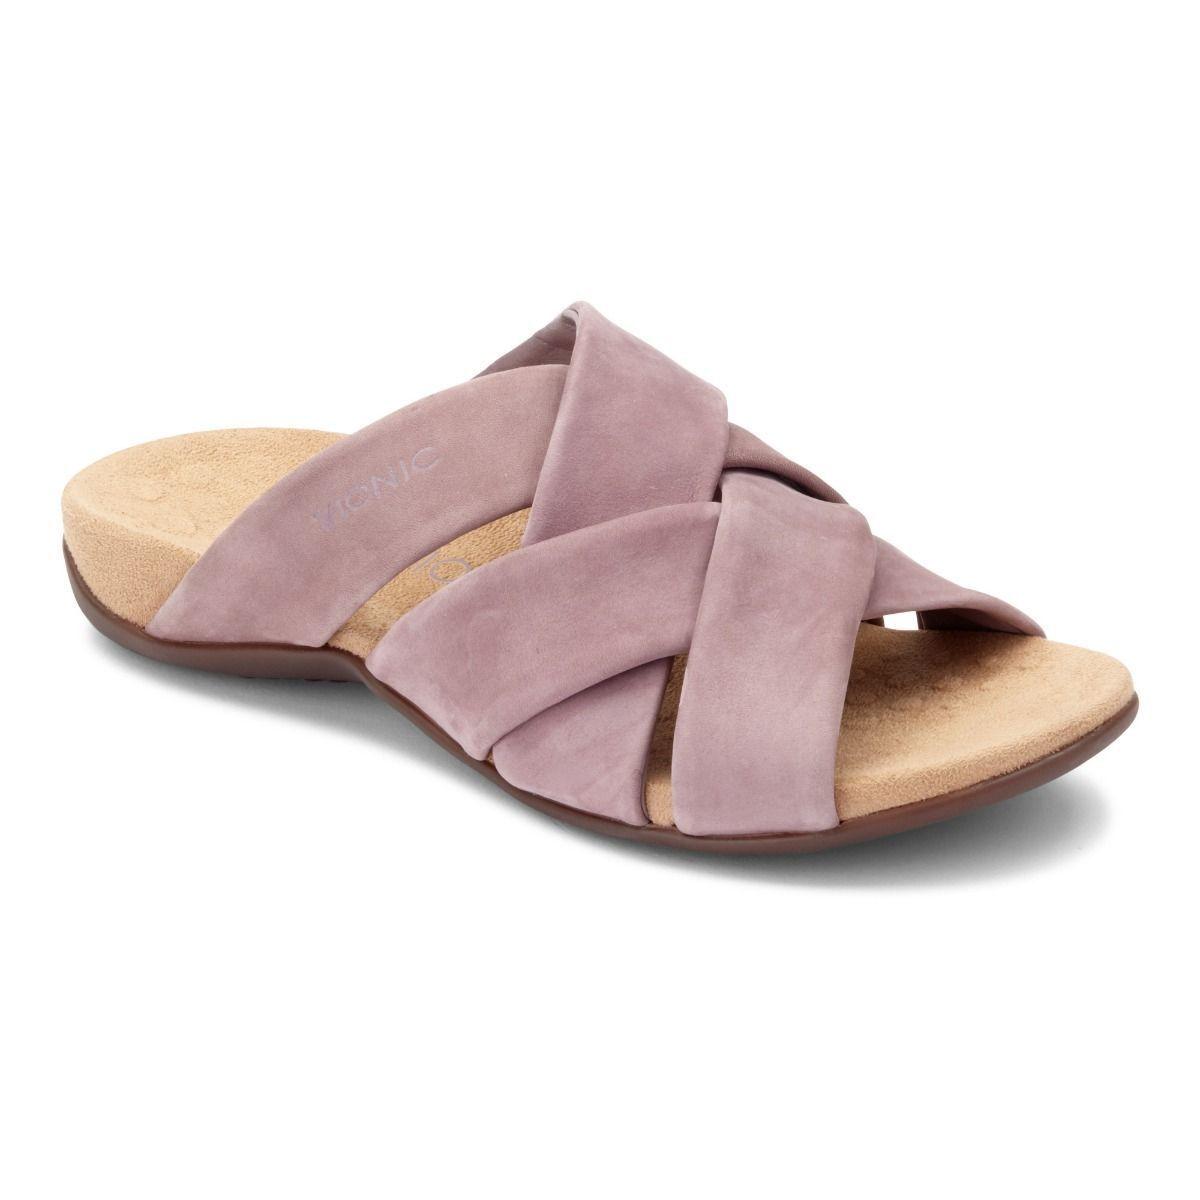 Vionic Orthotic Casual Juno Slide Sandals Orth Technology - Dusk rosa